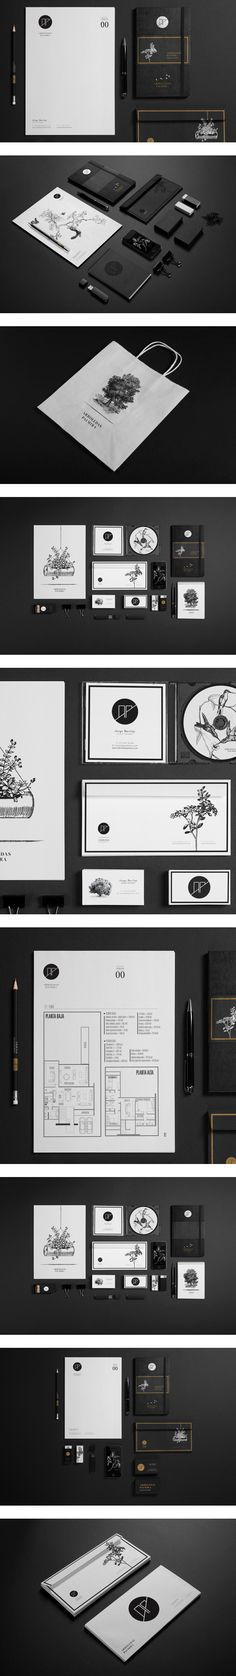 AP by Diego Leyva, via Behance | #stationary #corporate #design #corporatedesign